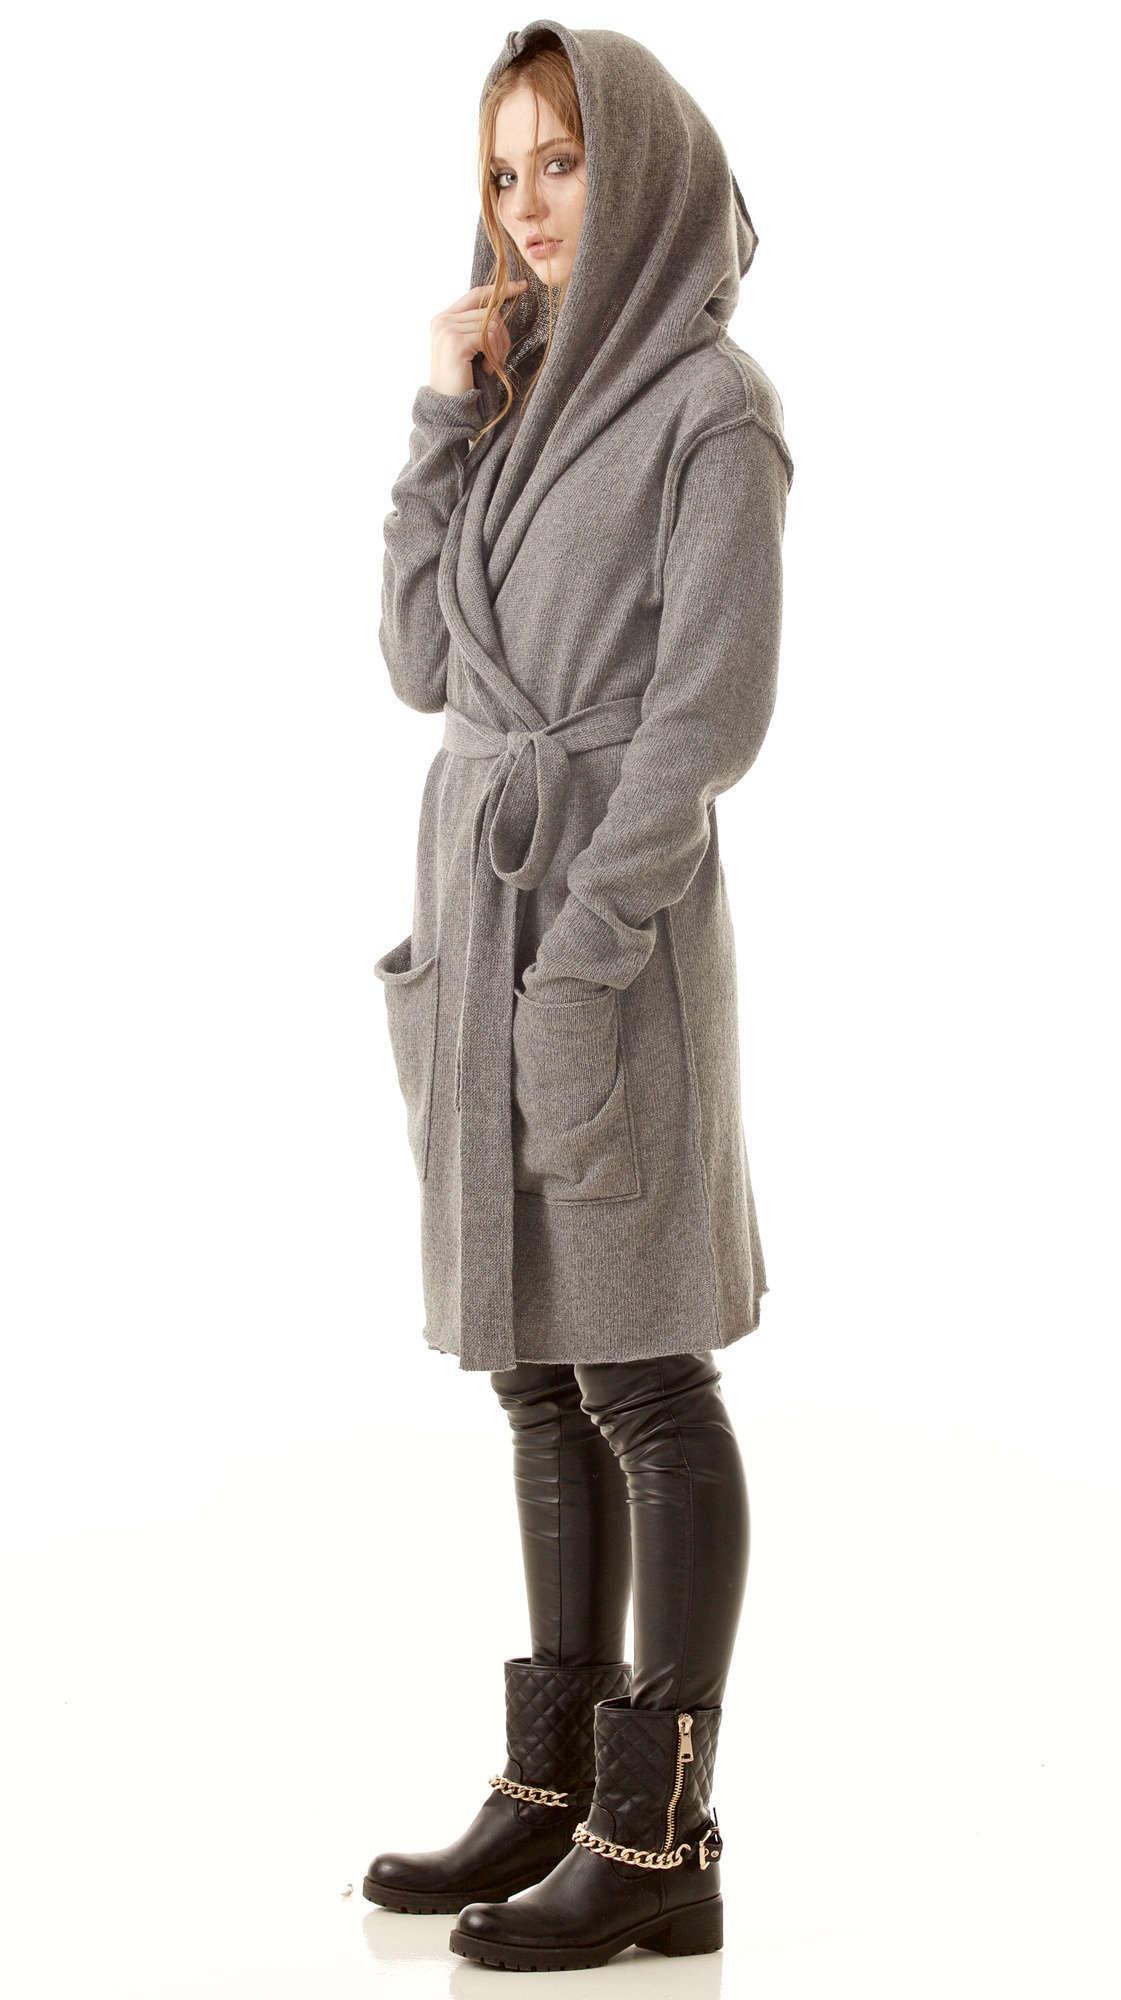 grey long cashmere womens cardigan edith. Black Bedroom Furniture Sets. Home Design Ideas